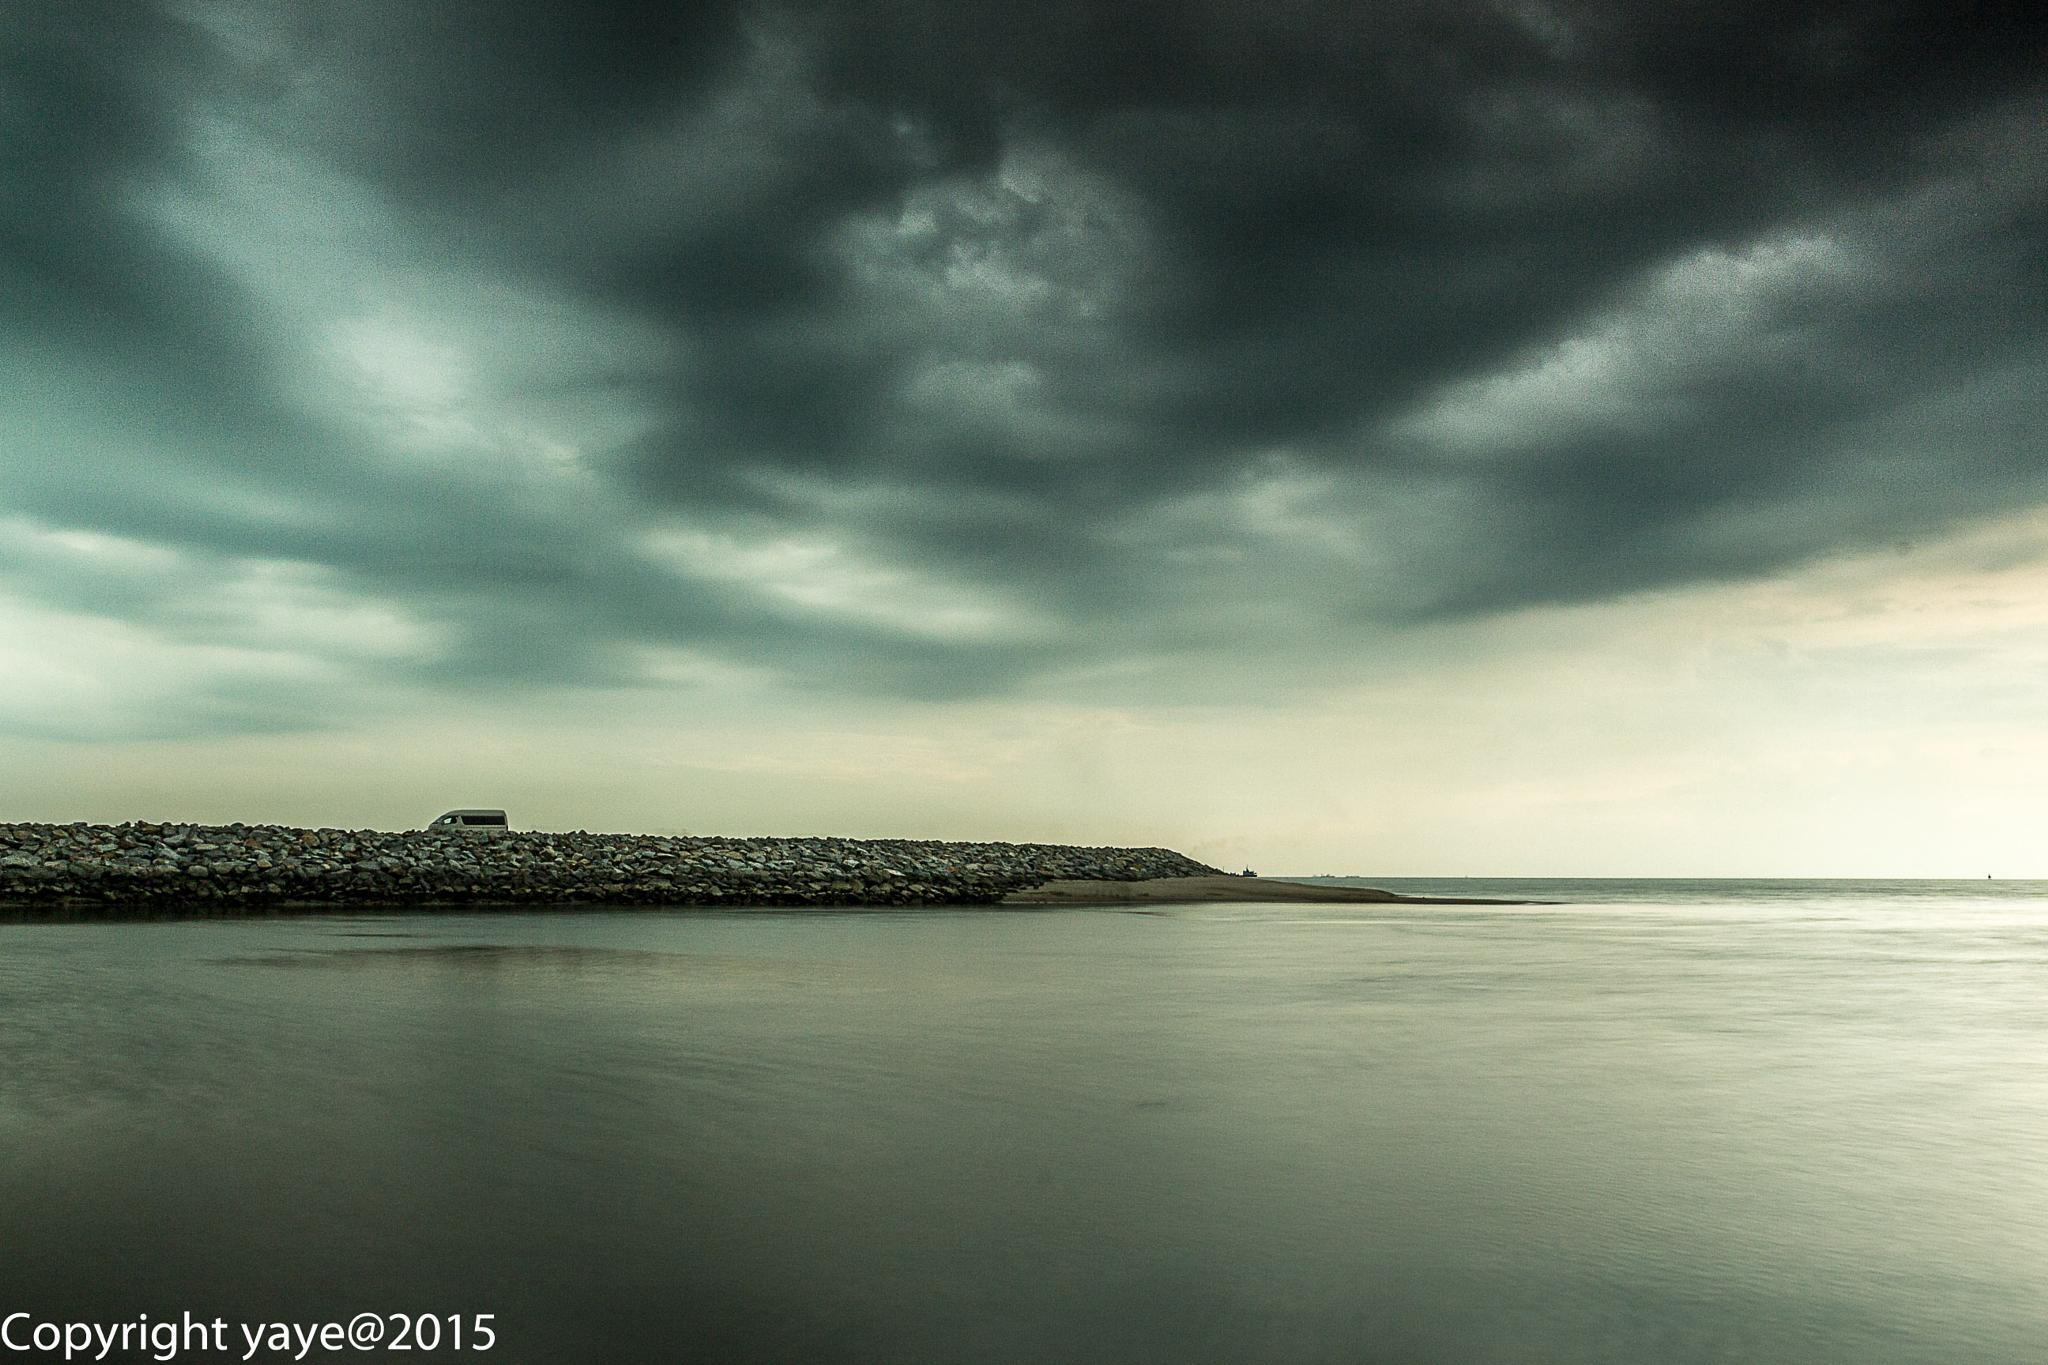 Clouds by yaye